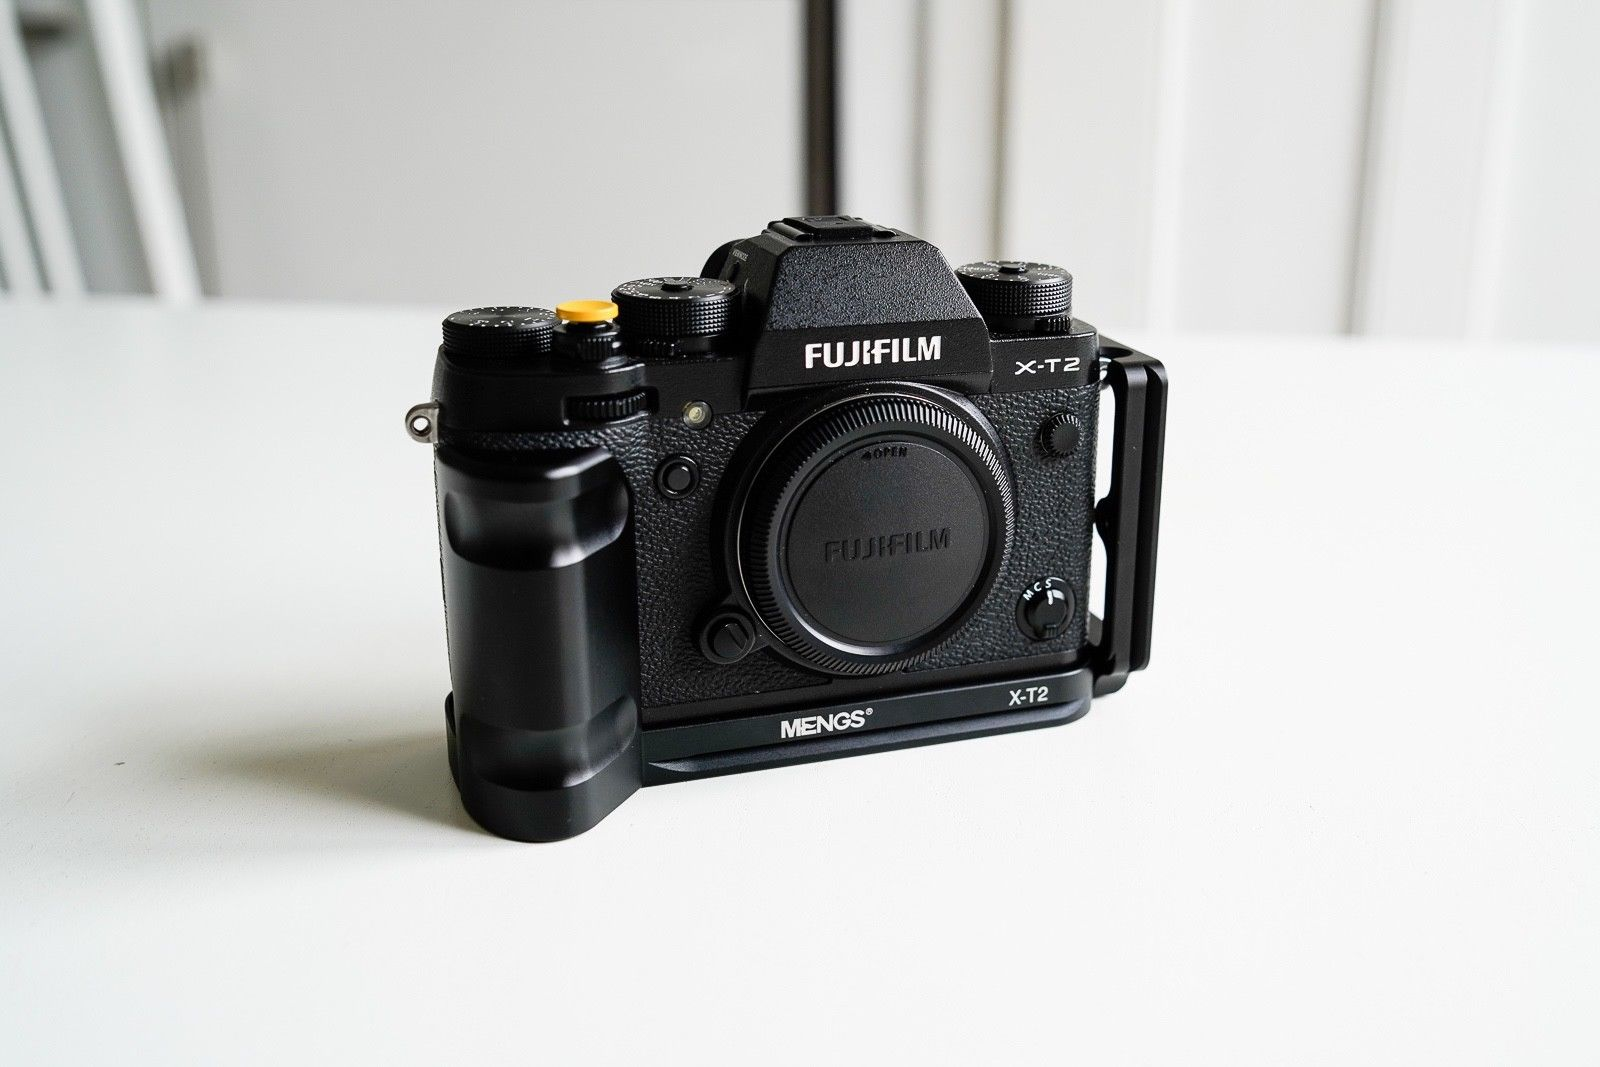 Fujifilm X-T2 Gehäuse Body schwarz / Neuwertig